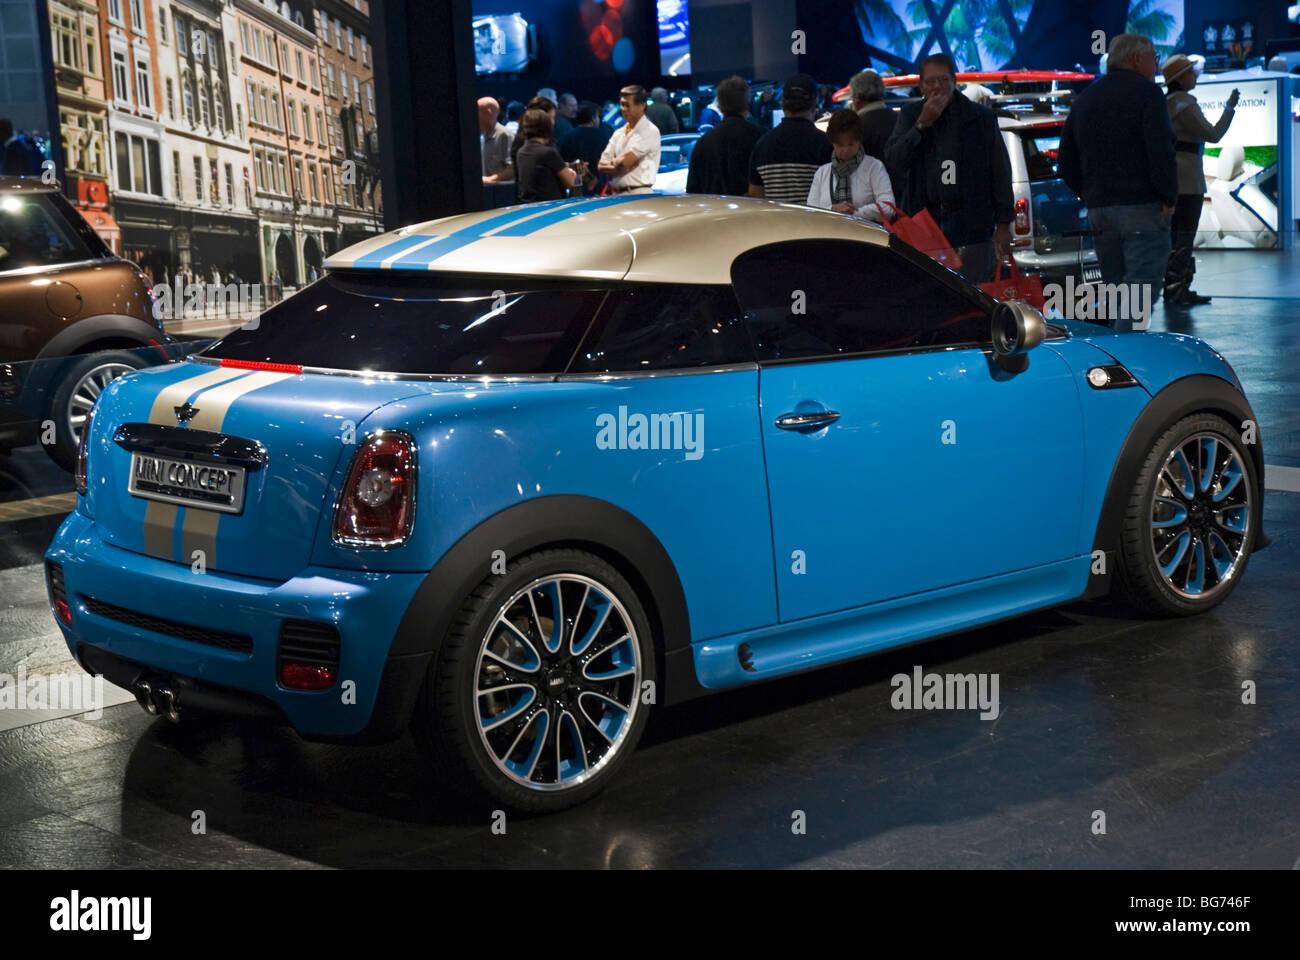 The Bmw Mini Coupe Concept Na Debut At The 2009 La Auto Show In